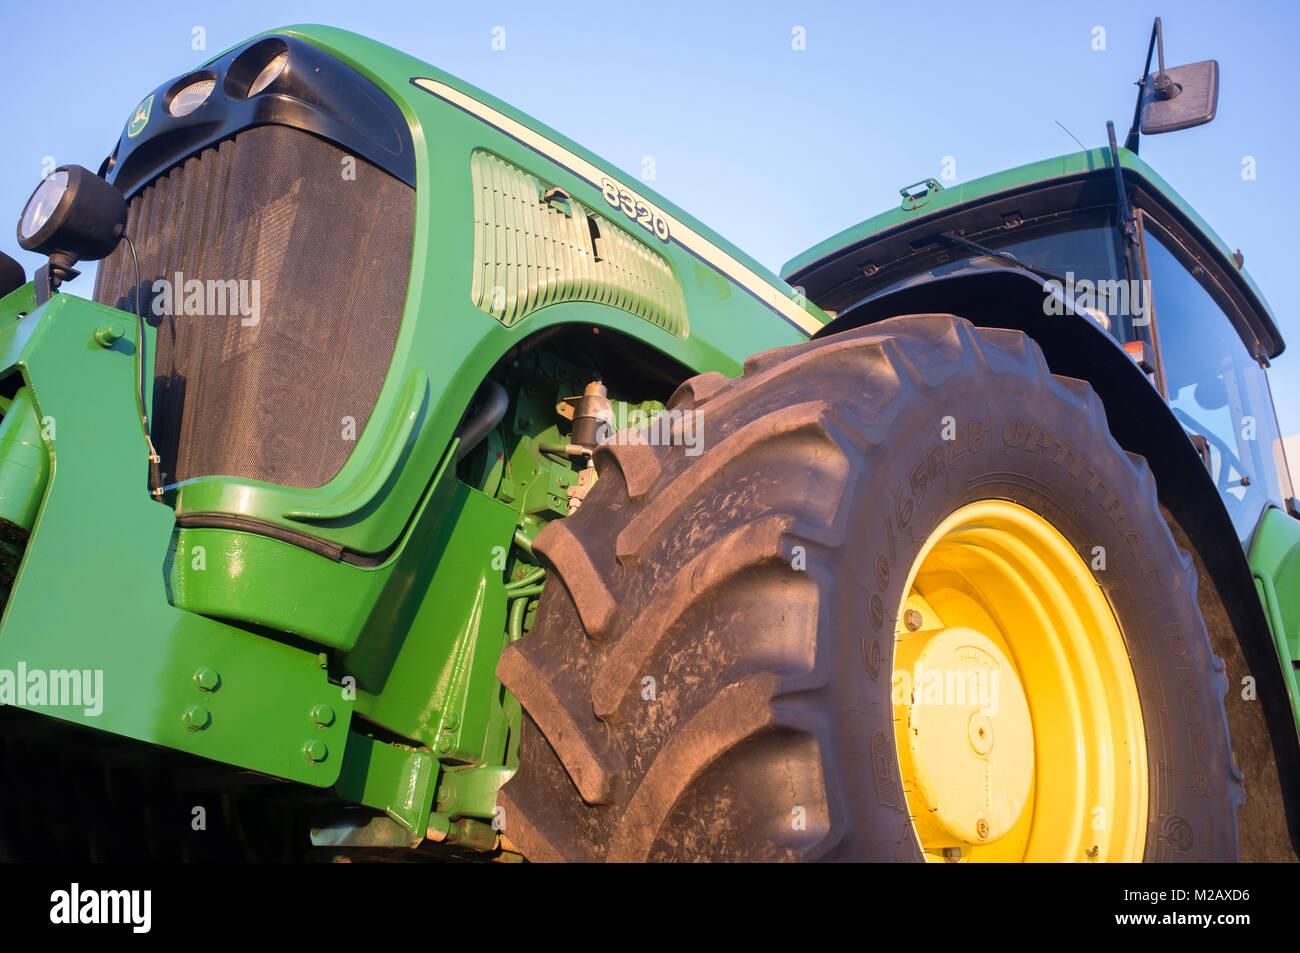 Badajoz, Spain - August 6th, 2017: Row Crop Tractor John Deere 8320. Low side view - Stock Image